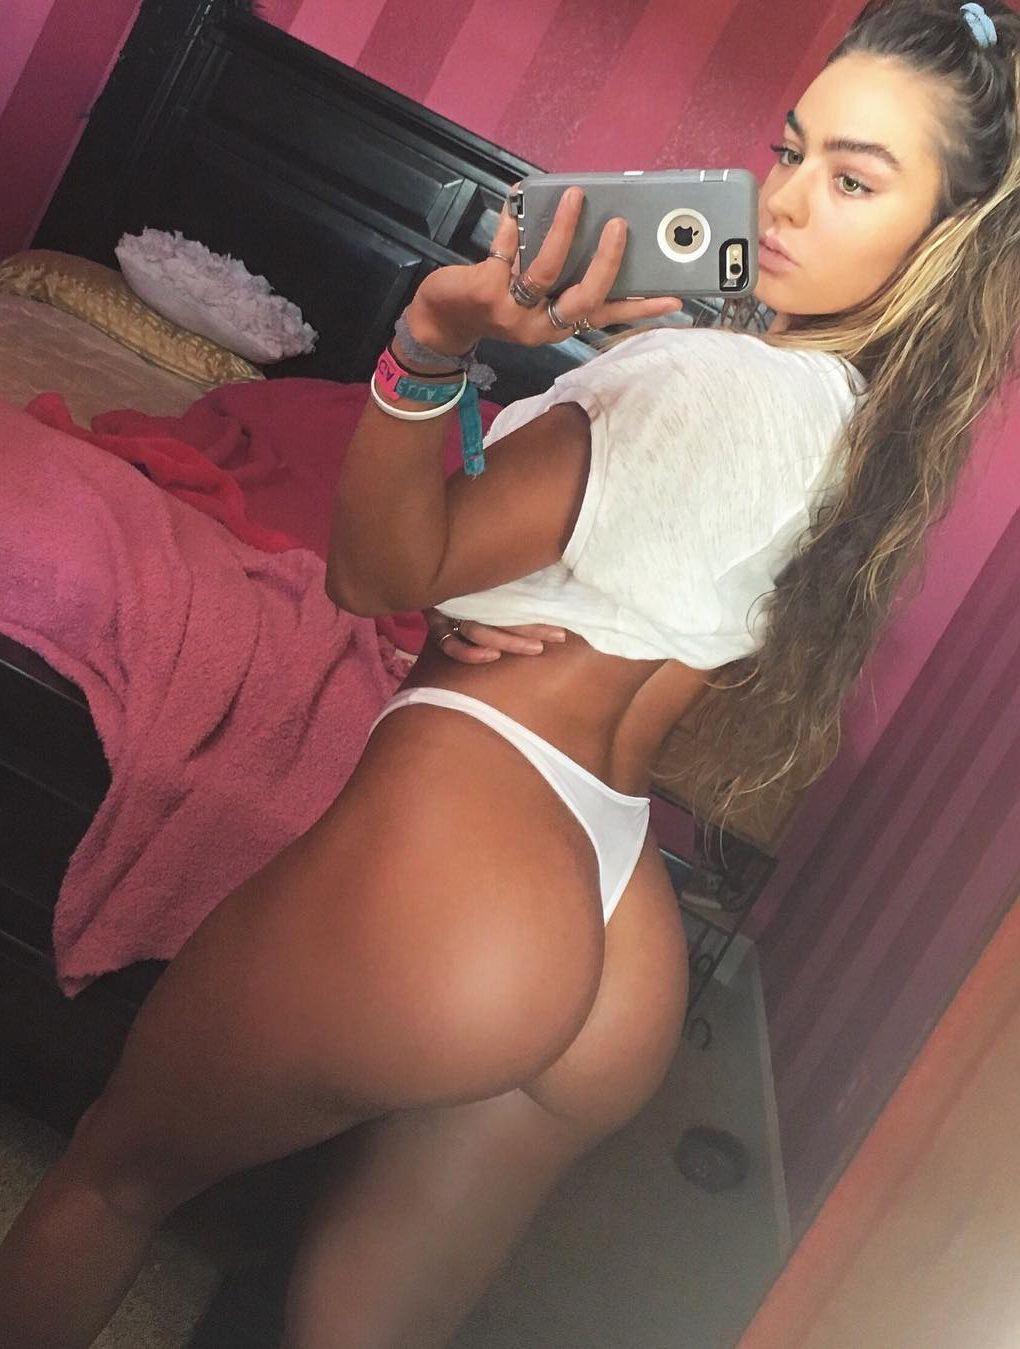 Teen dreams hot latina girls — img 2